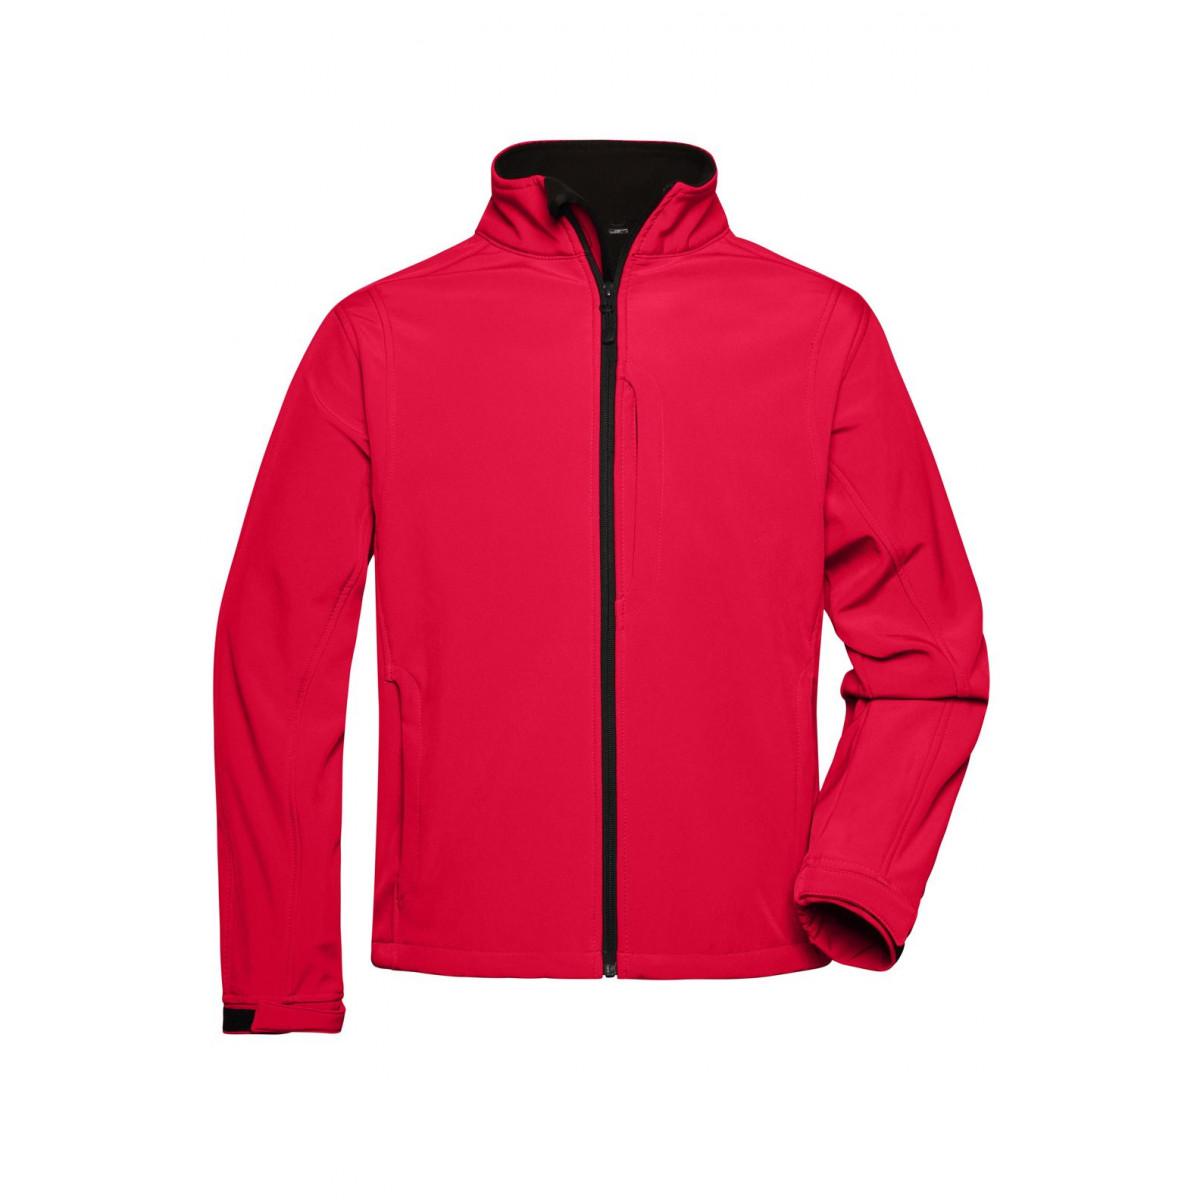 Куртка мужская JN135 Mens Softshell Jacket - Красный